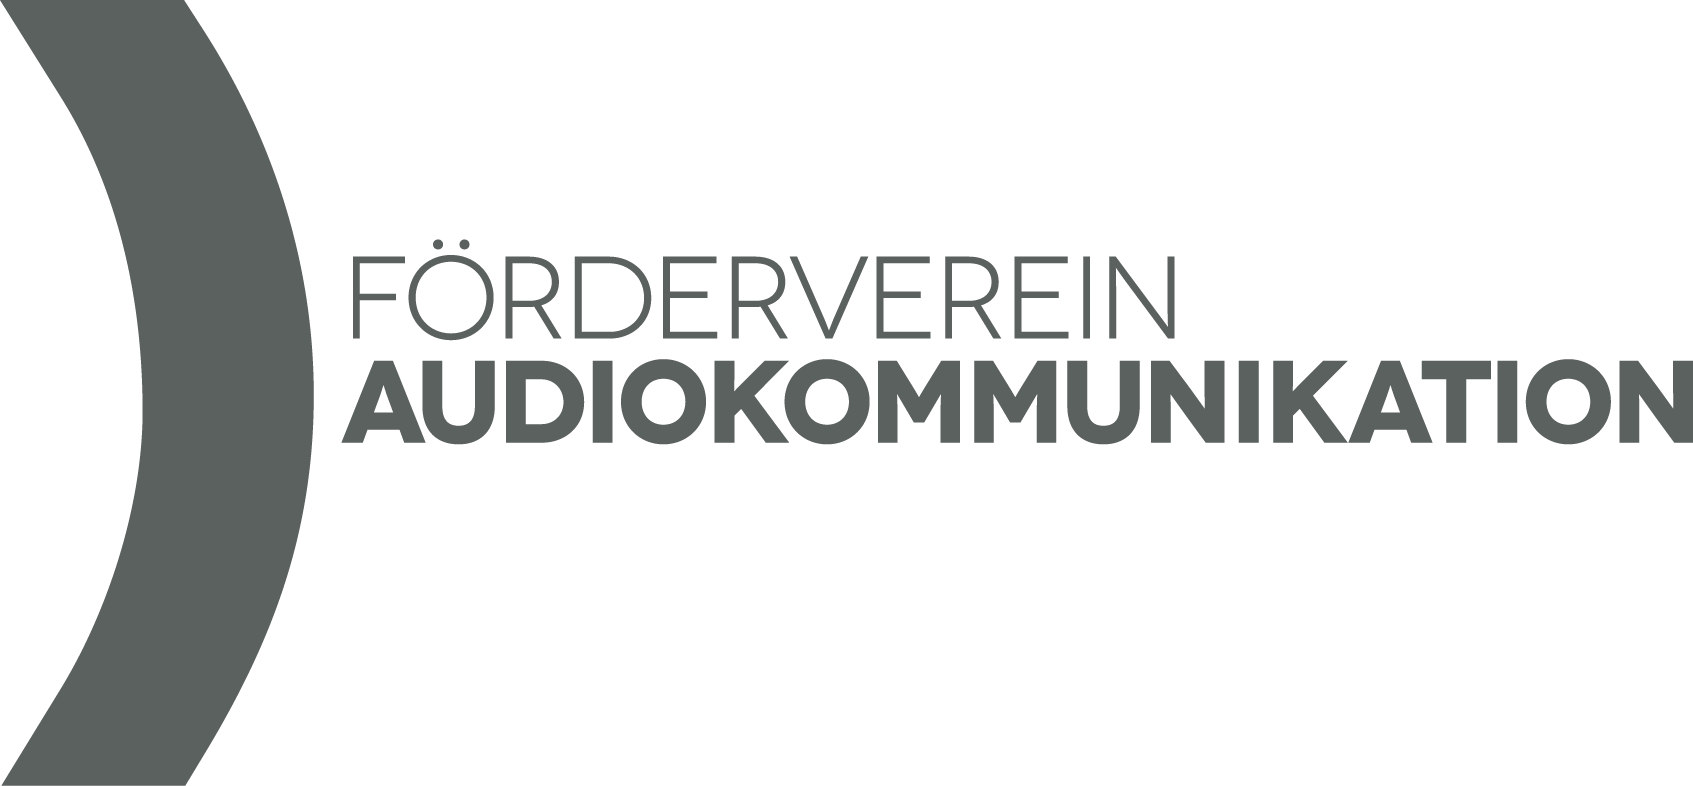 Förderverein Audiokommunikation